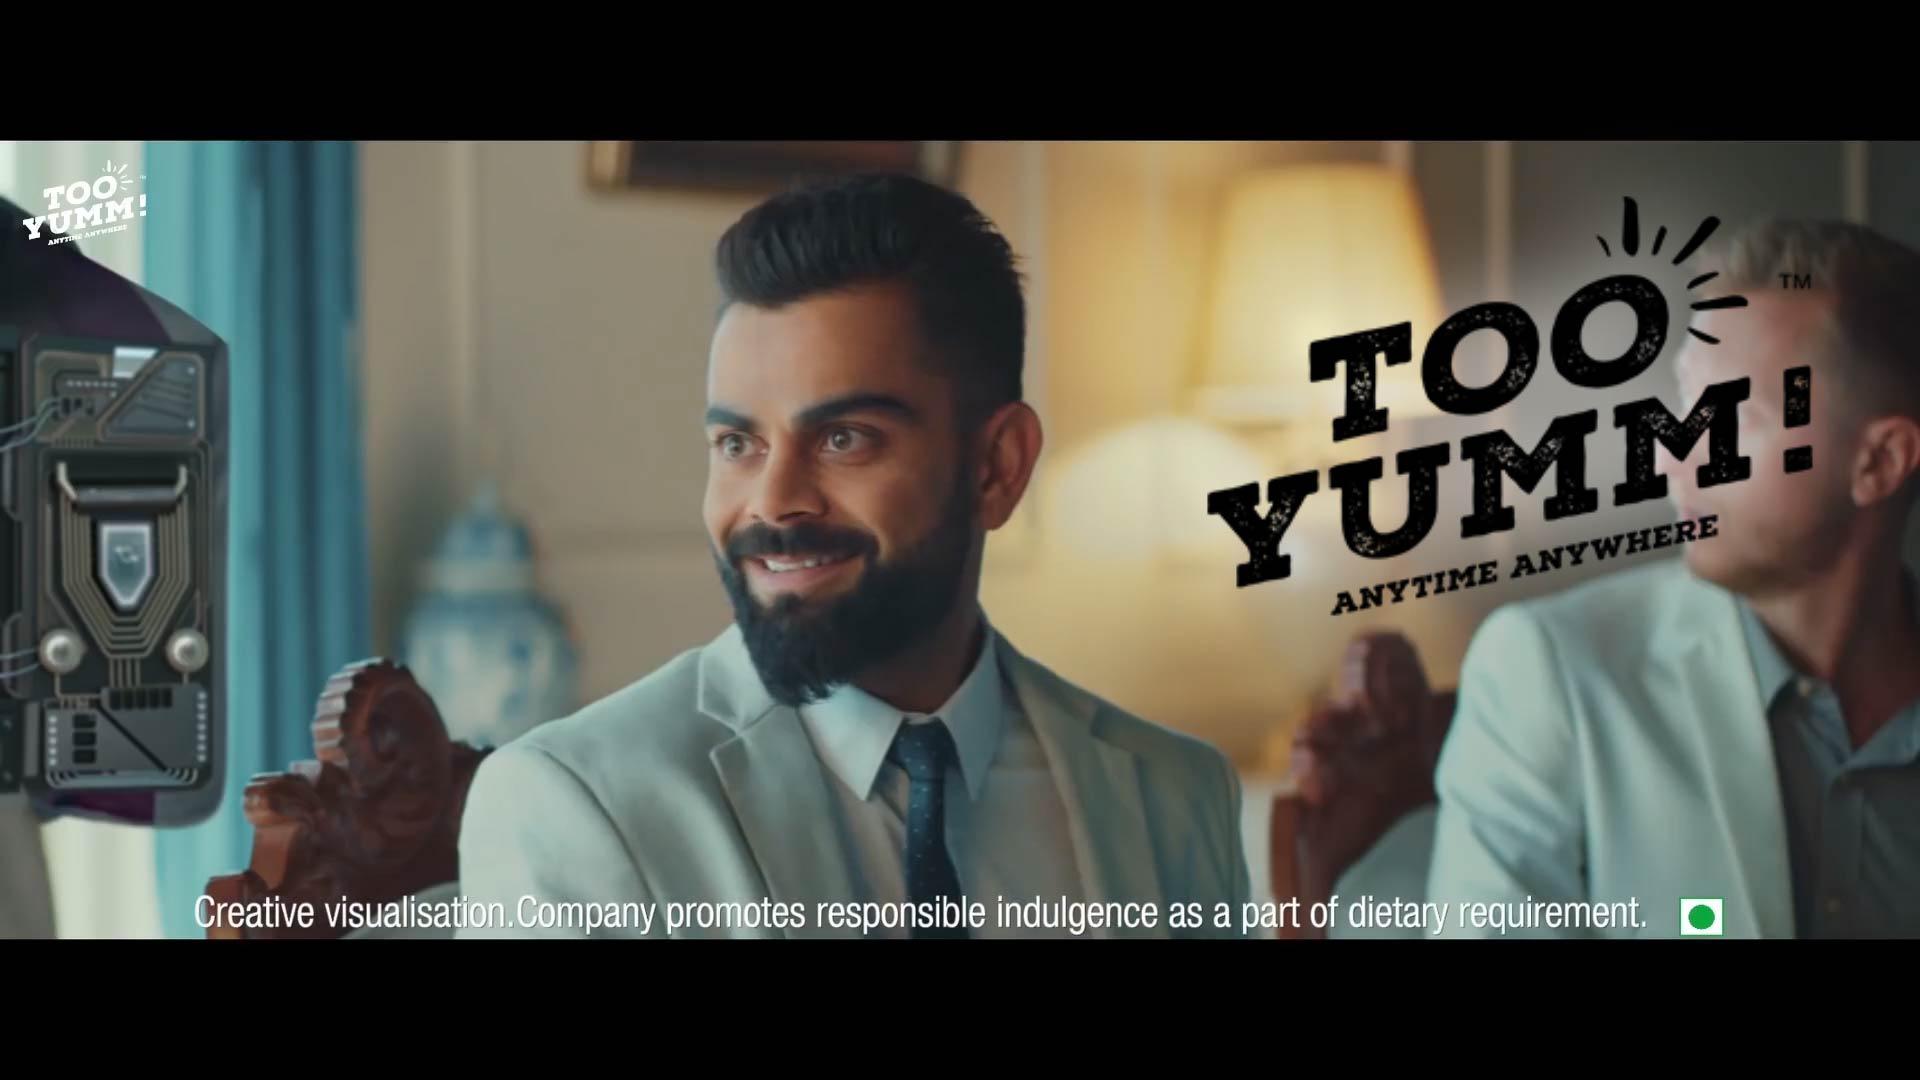 Too Yumm! Chilli Chataka Veggie Stix Ad